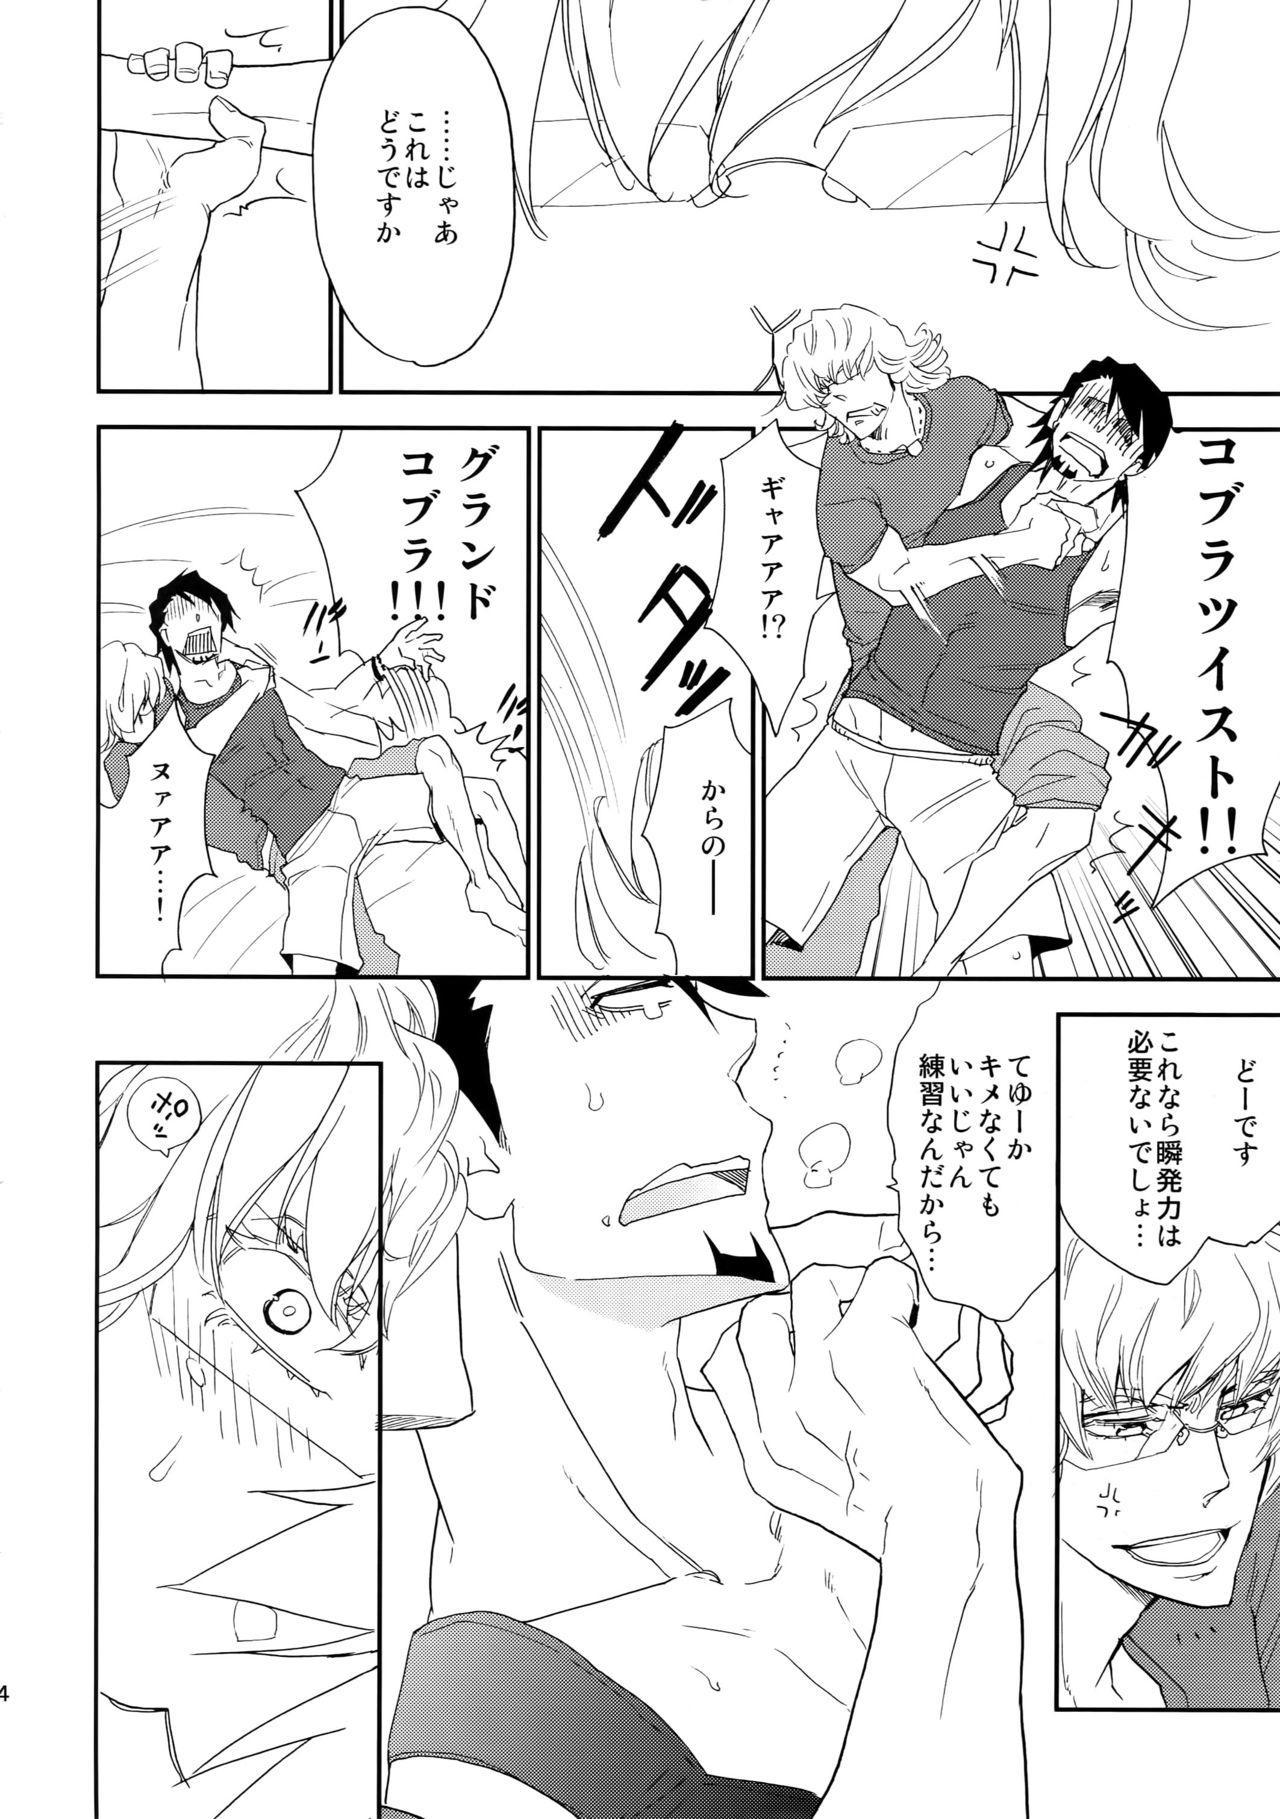 T&B Sairoku! 52